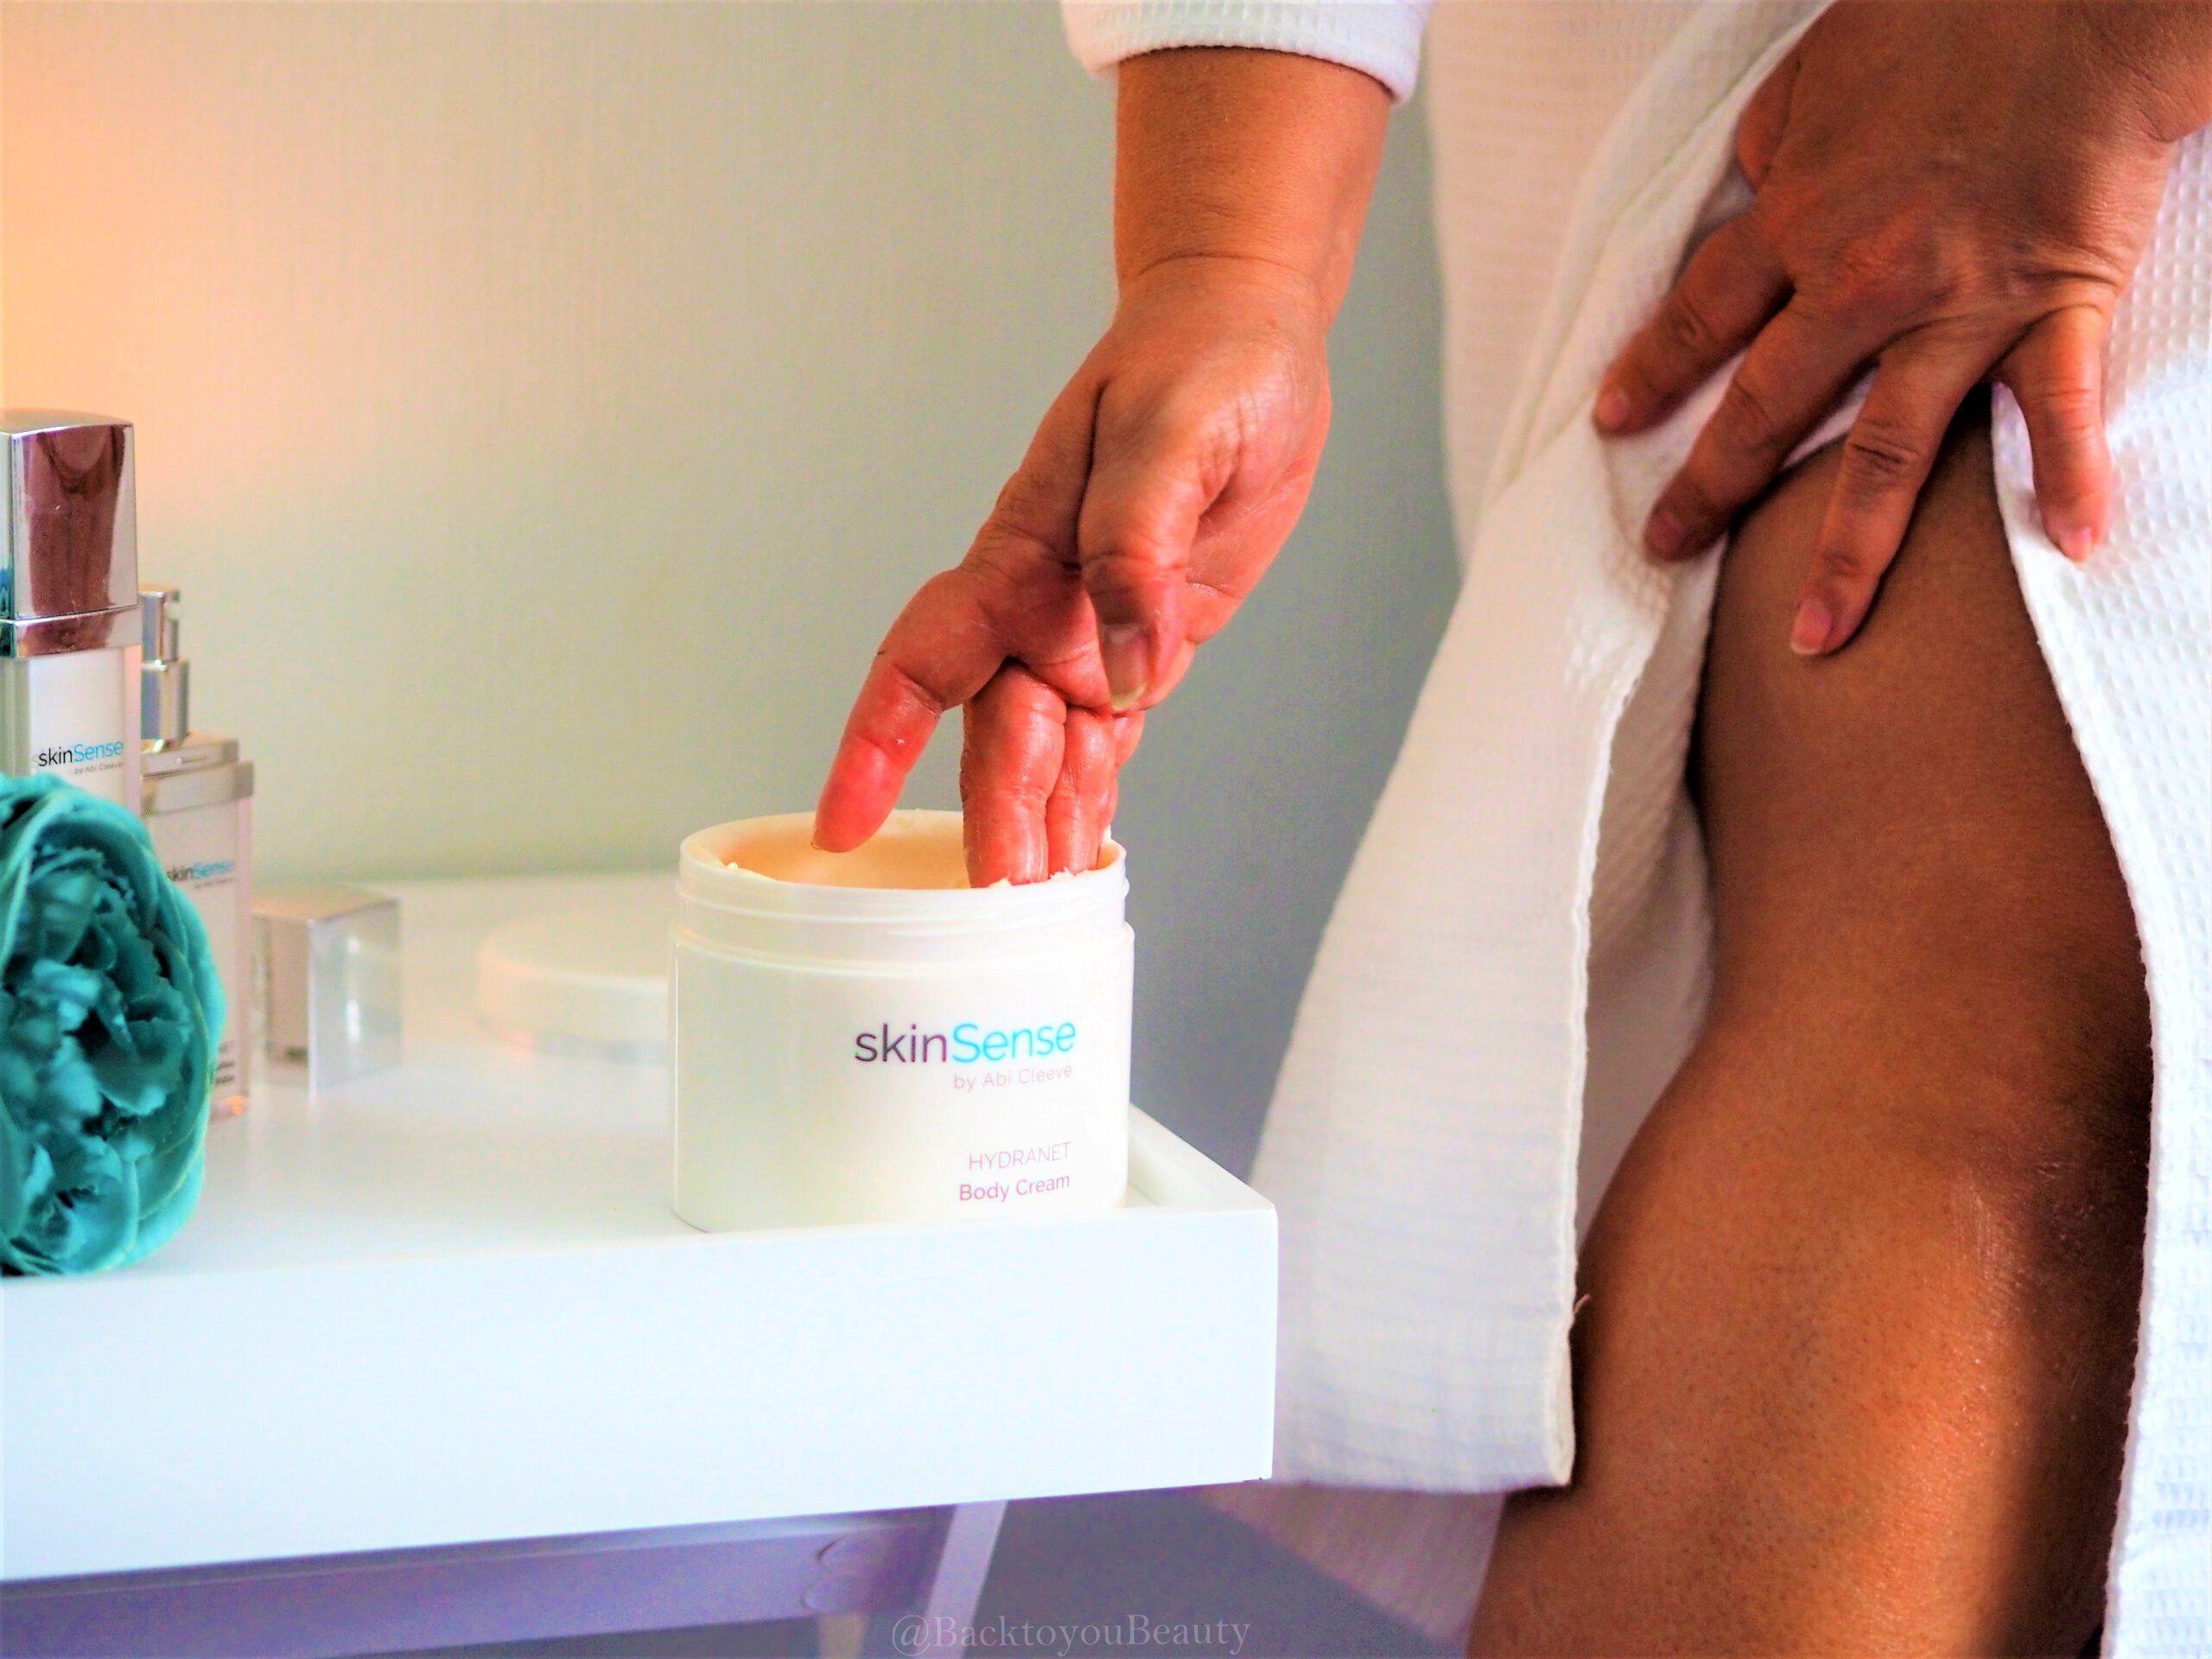 Applying Hydranet Body Cream